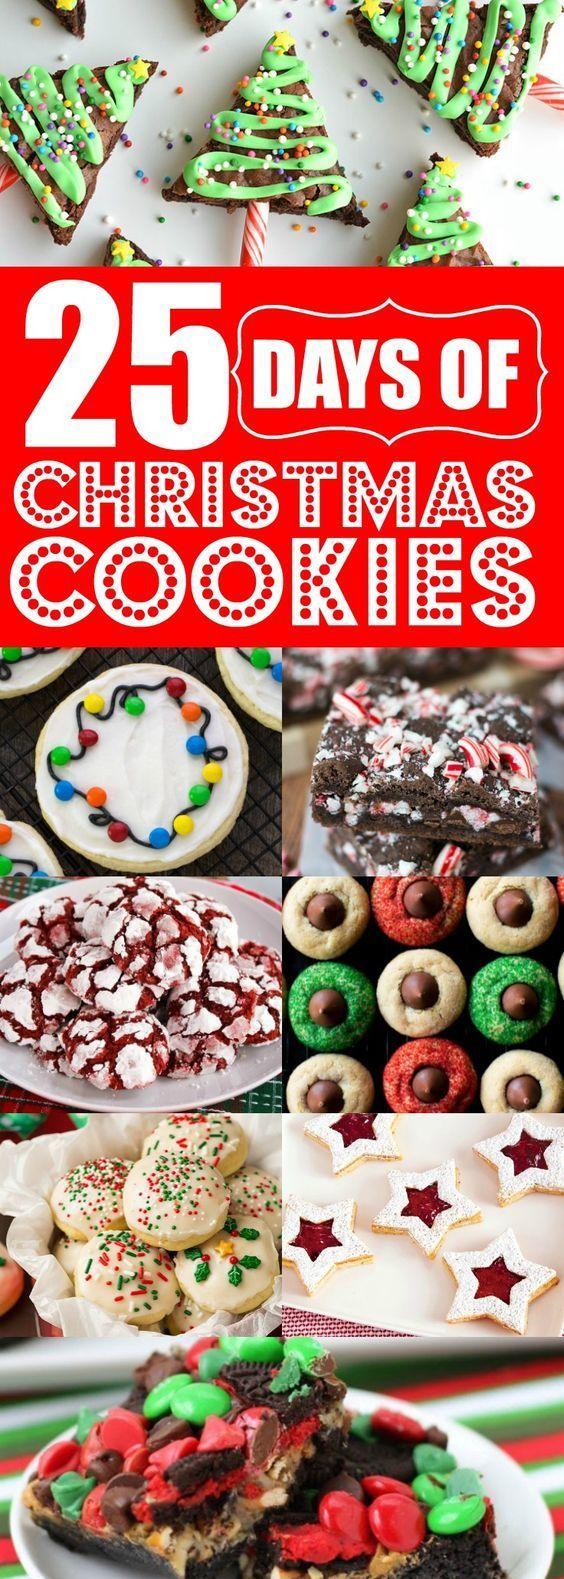 25 Days Of Christmas Cookies - (savvyhoney)